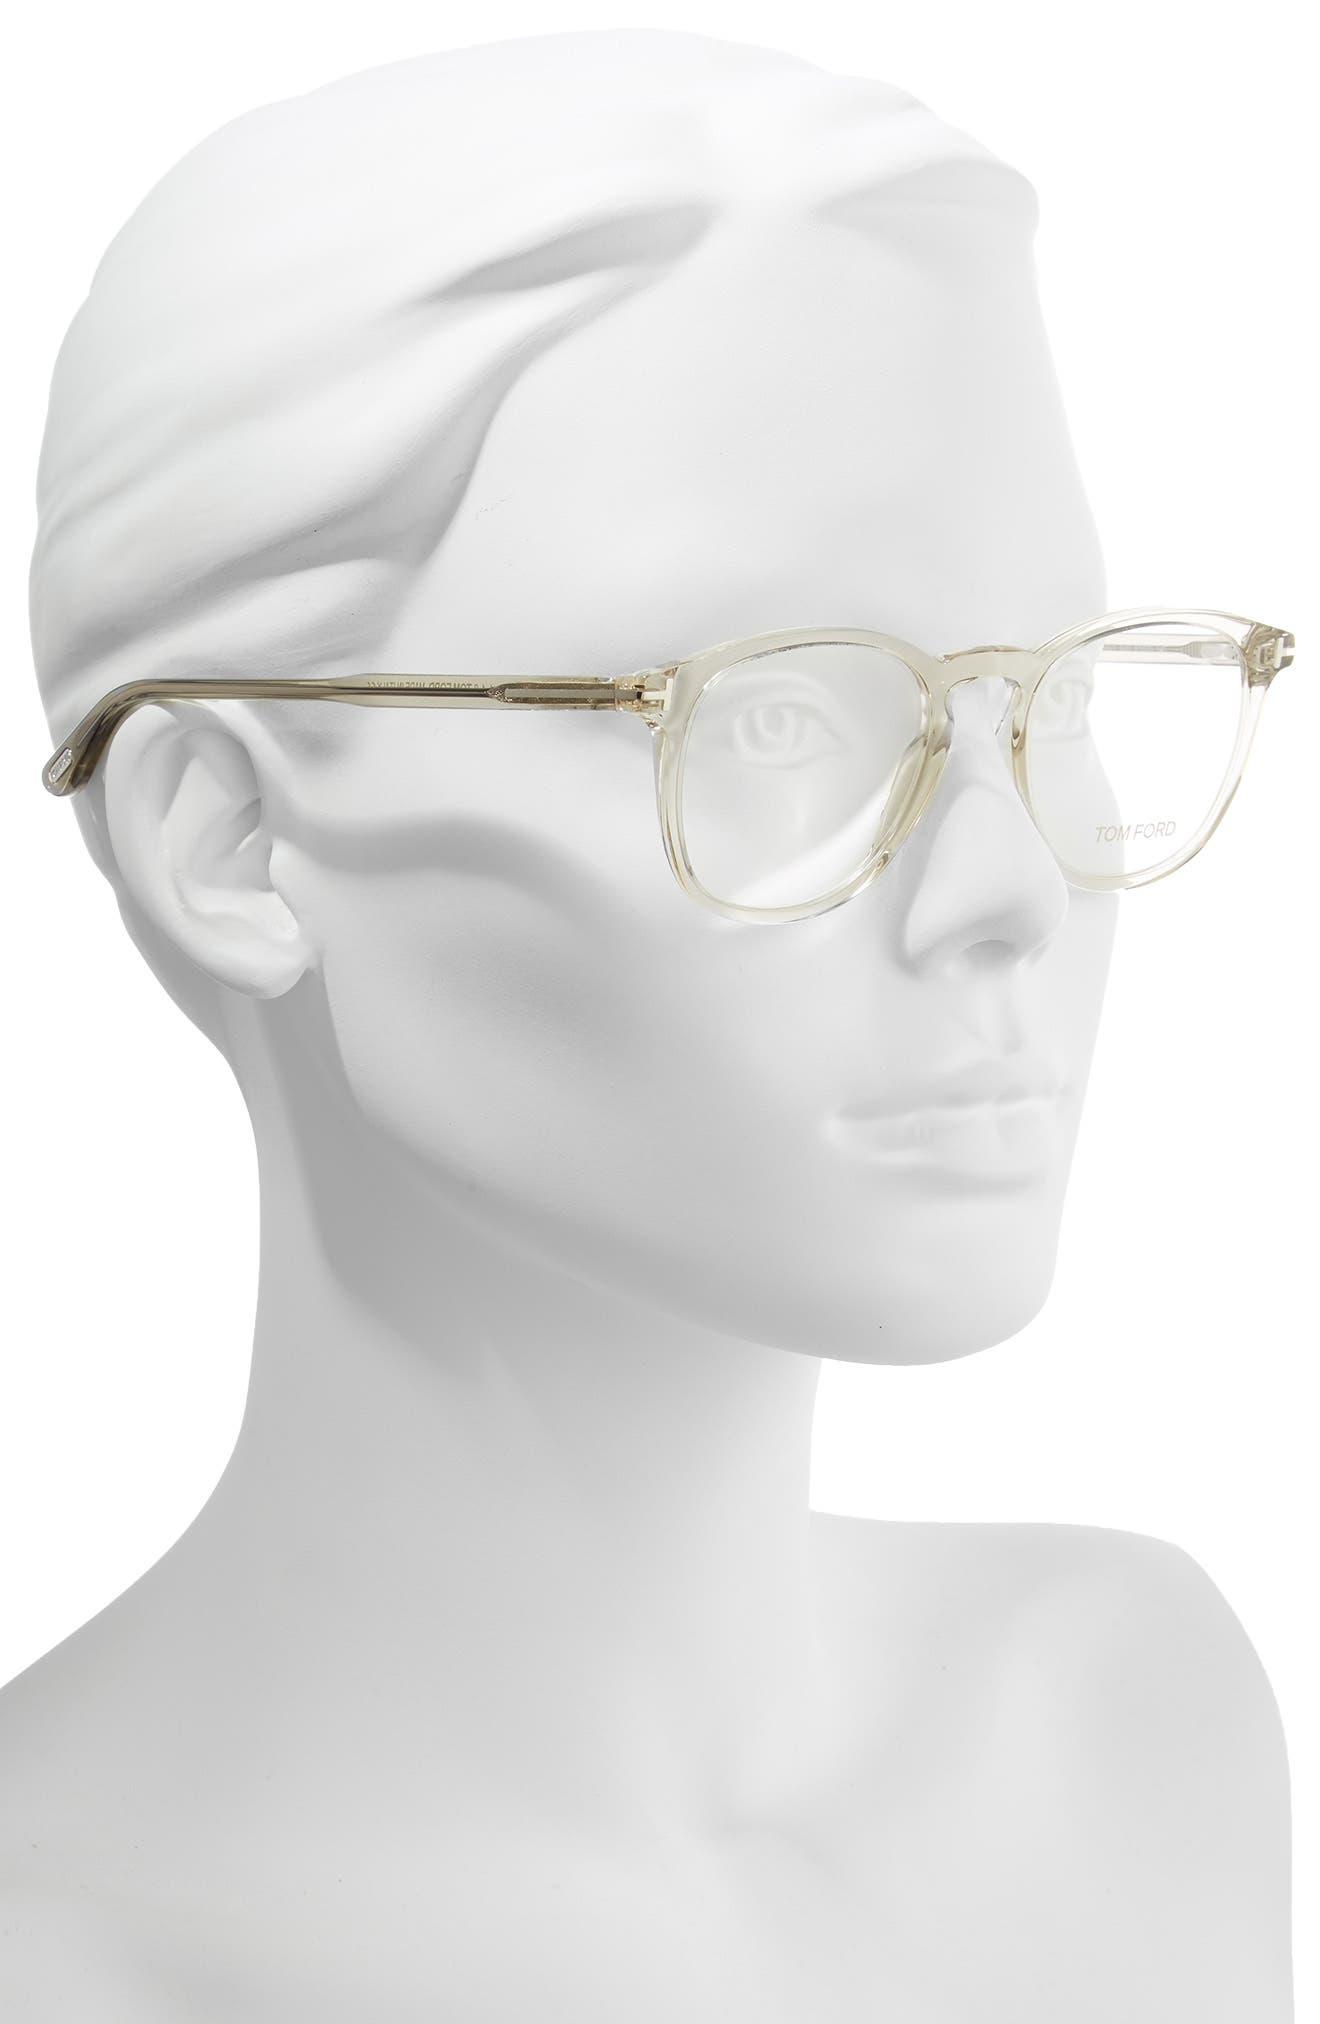 51mm Round Optical Glasses,                             Alternate thumbnail 2, color,                             SHINY TRANSPARENT GREY